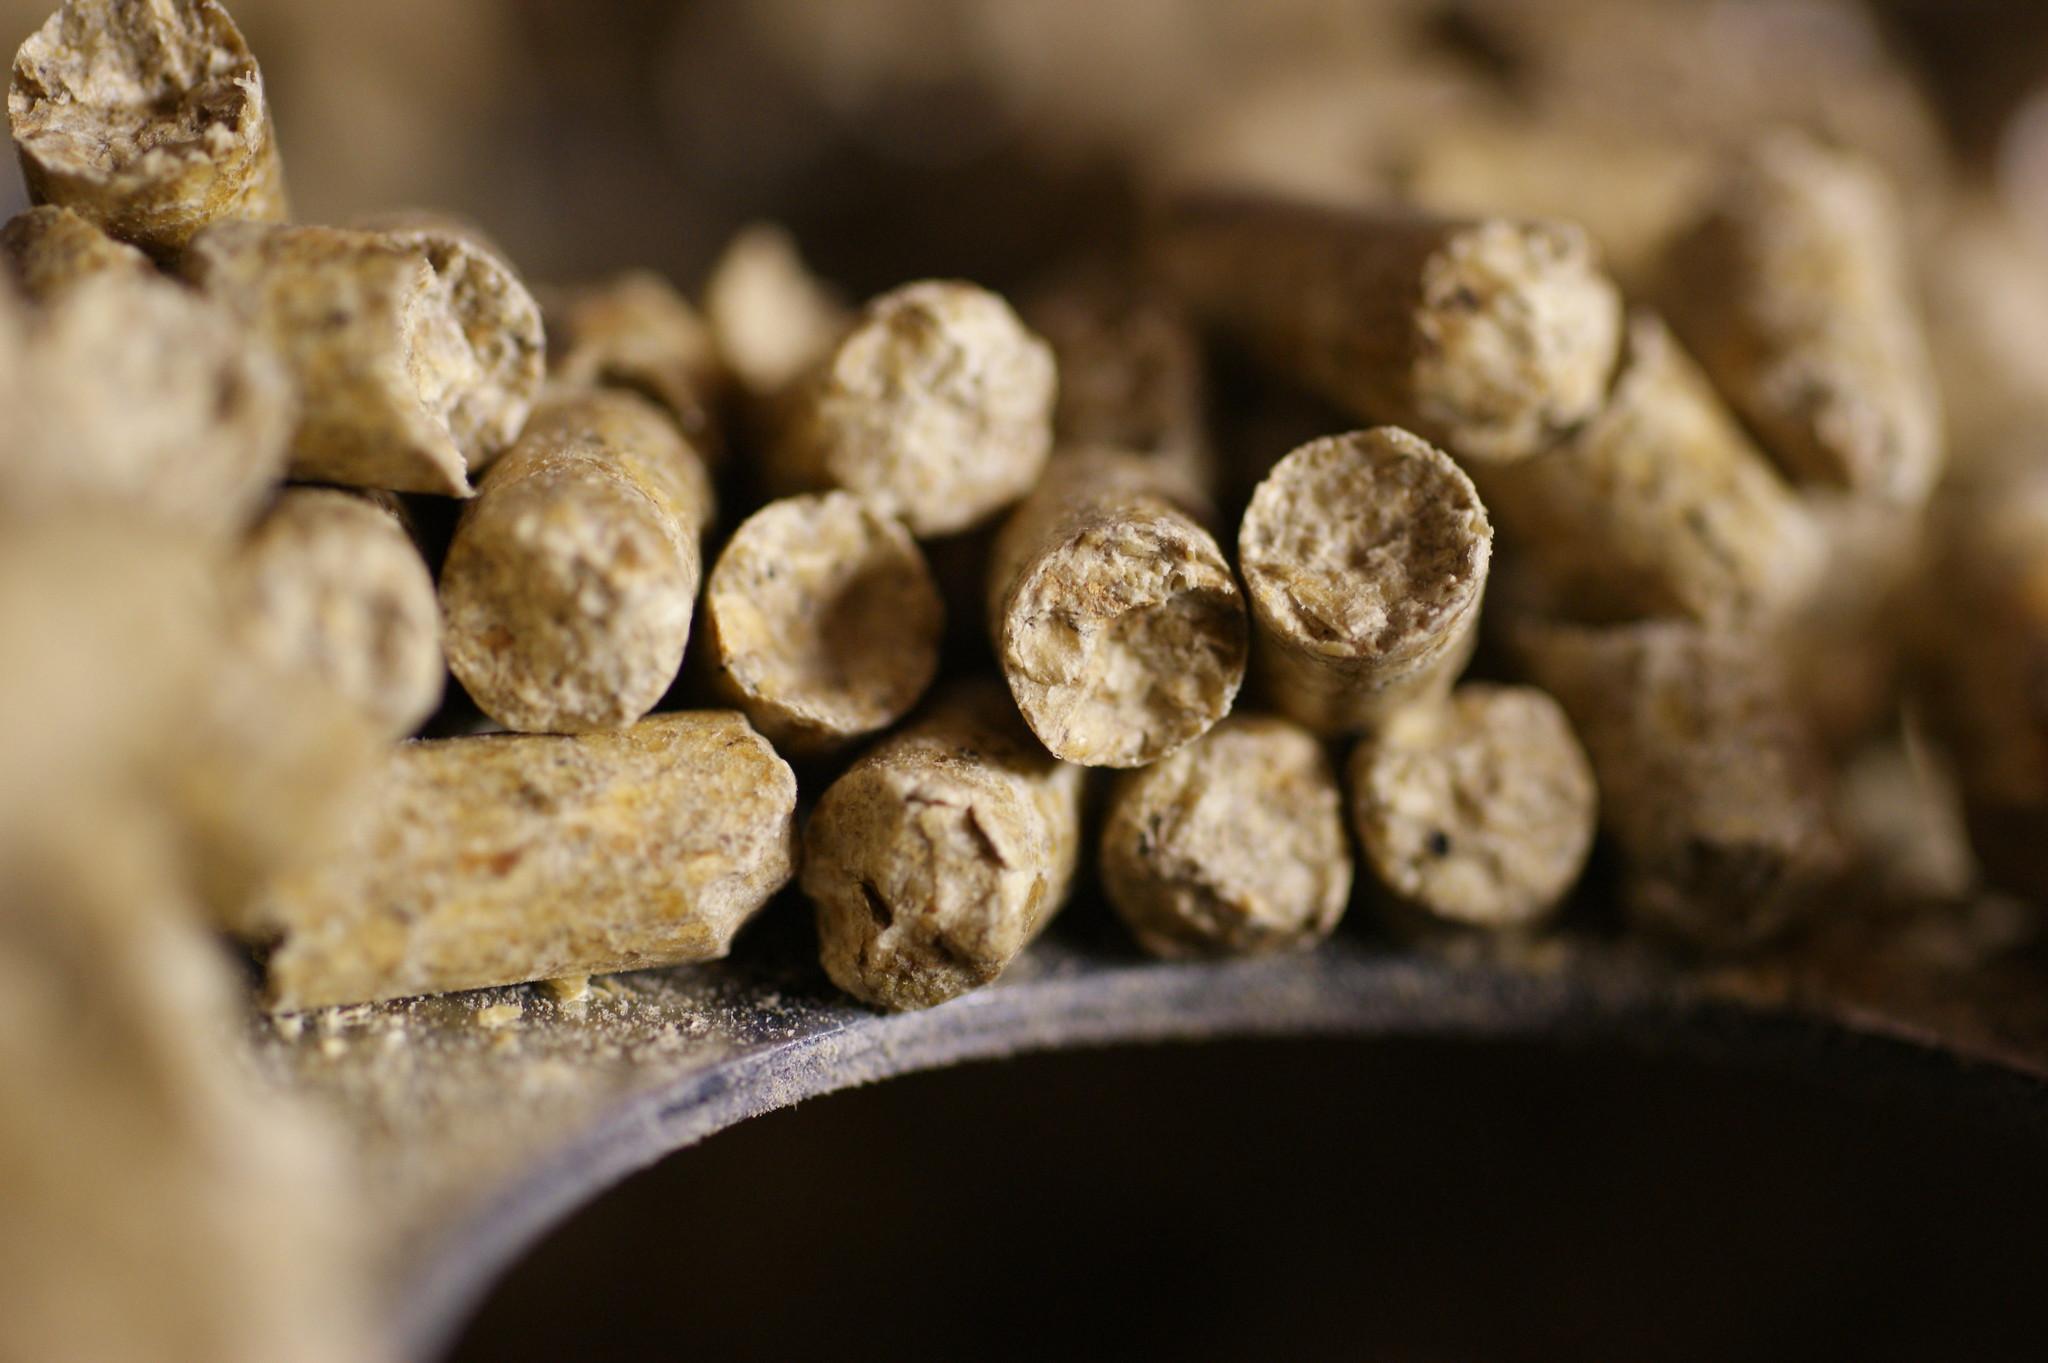 Wood Pellets biomass